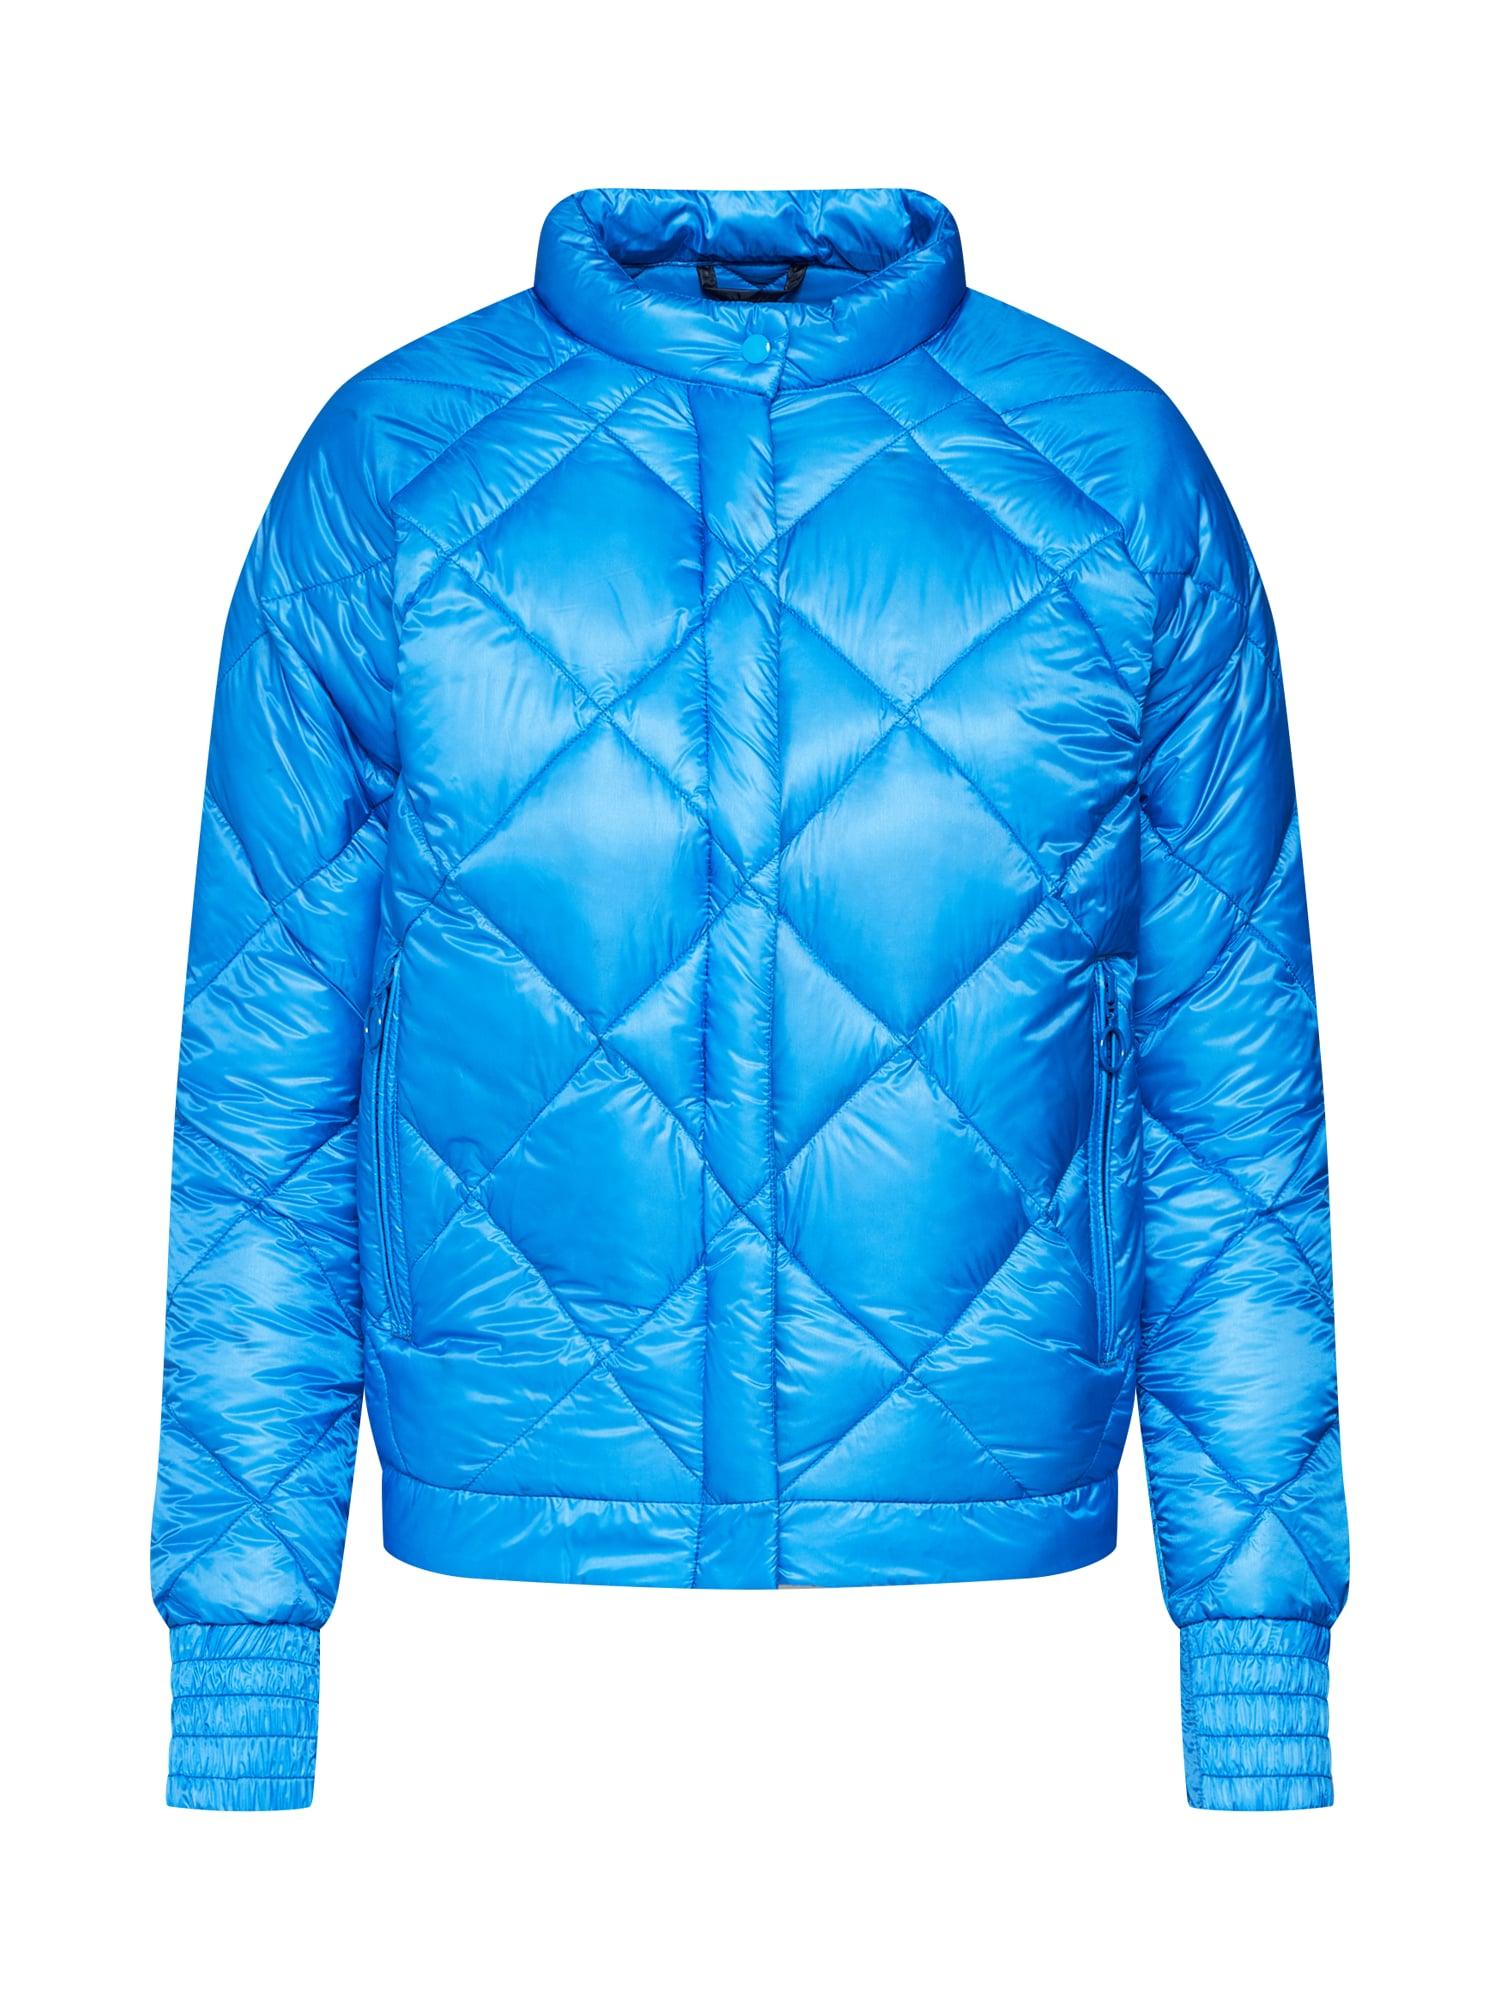 Zimní bunda Valbo modrá PYRENEX